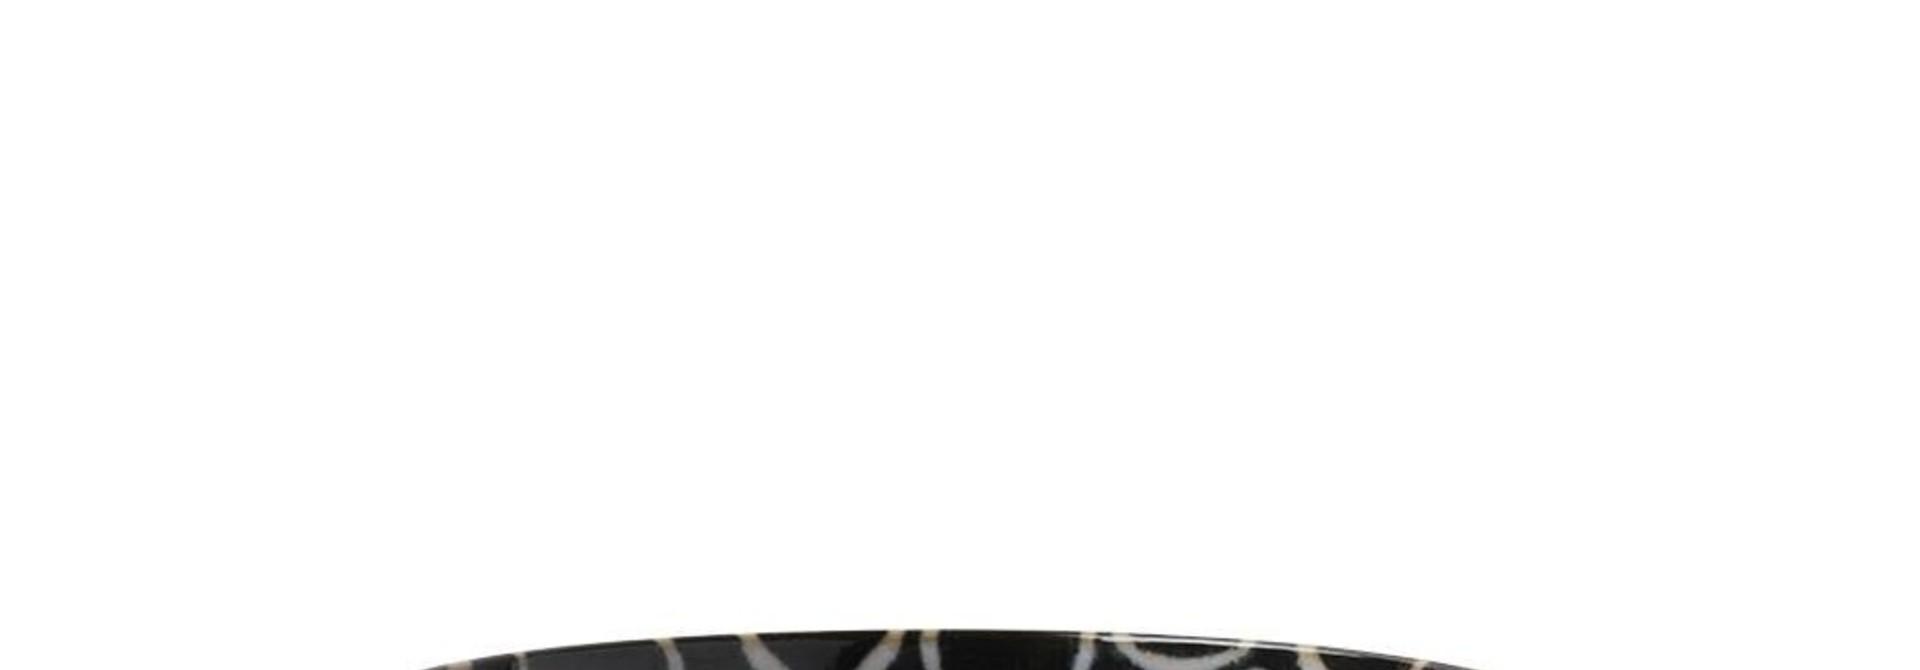 Shallow Bowl - Rustic White Circles